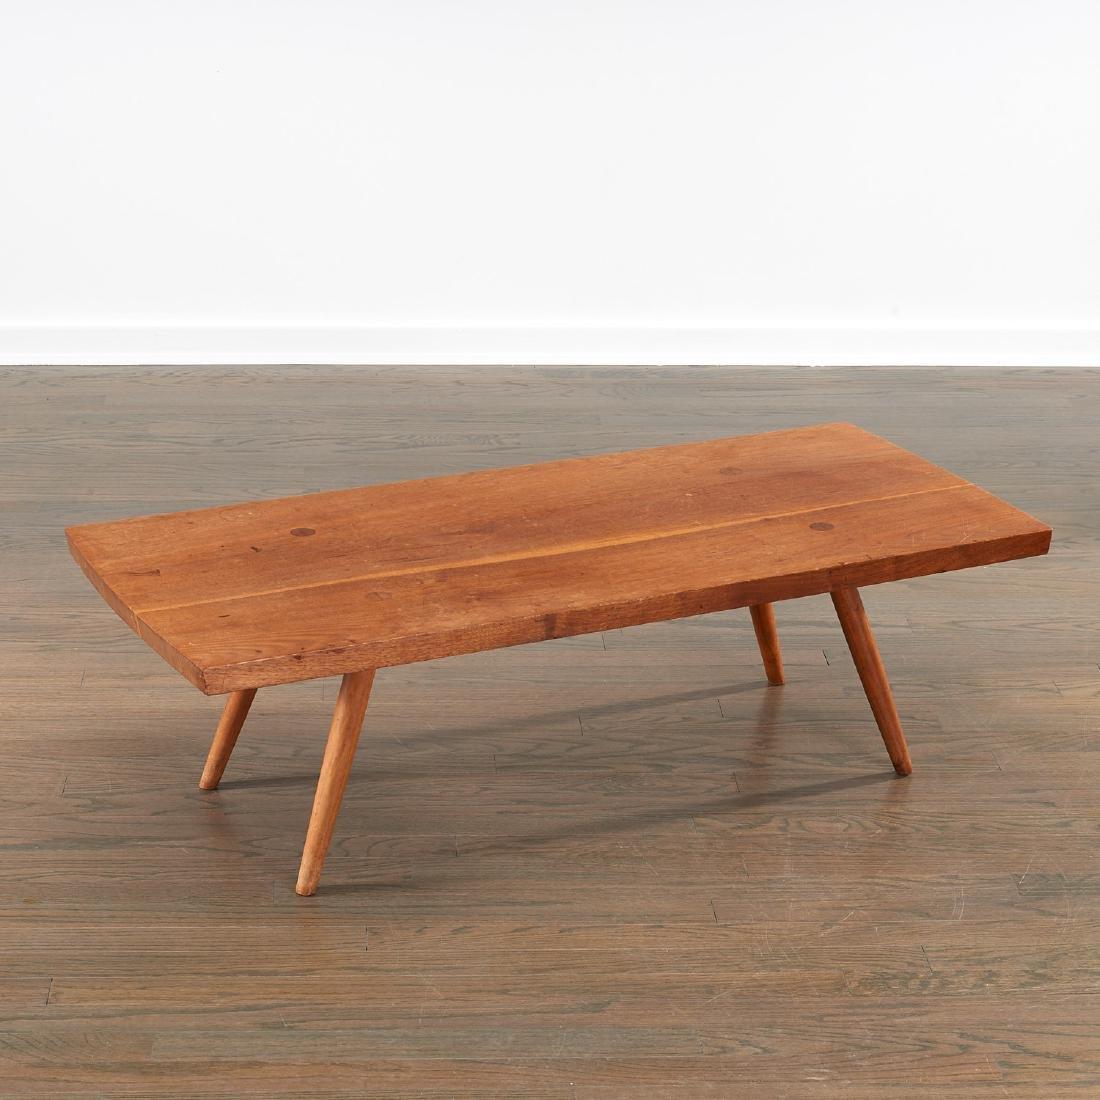 Early George Nakashima coffee table